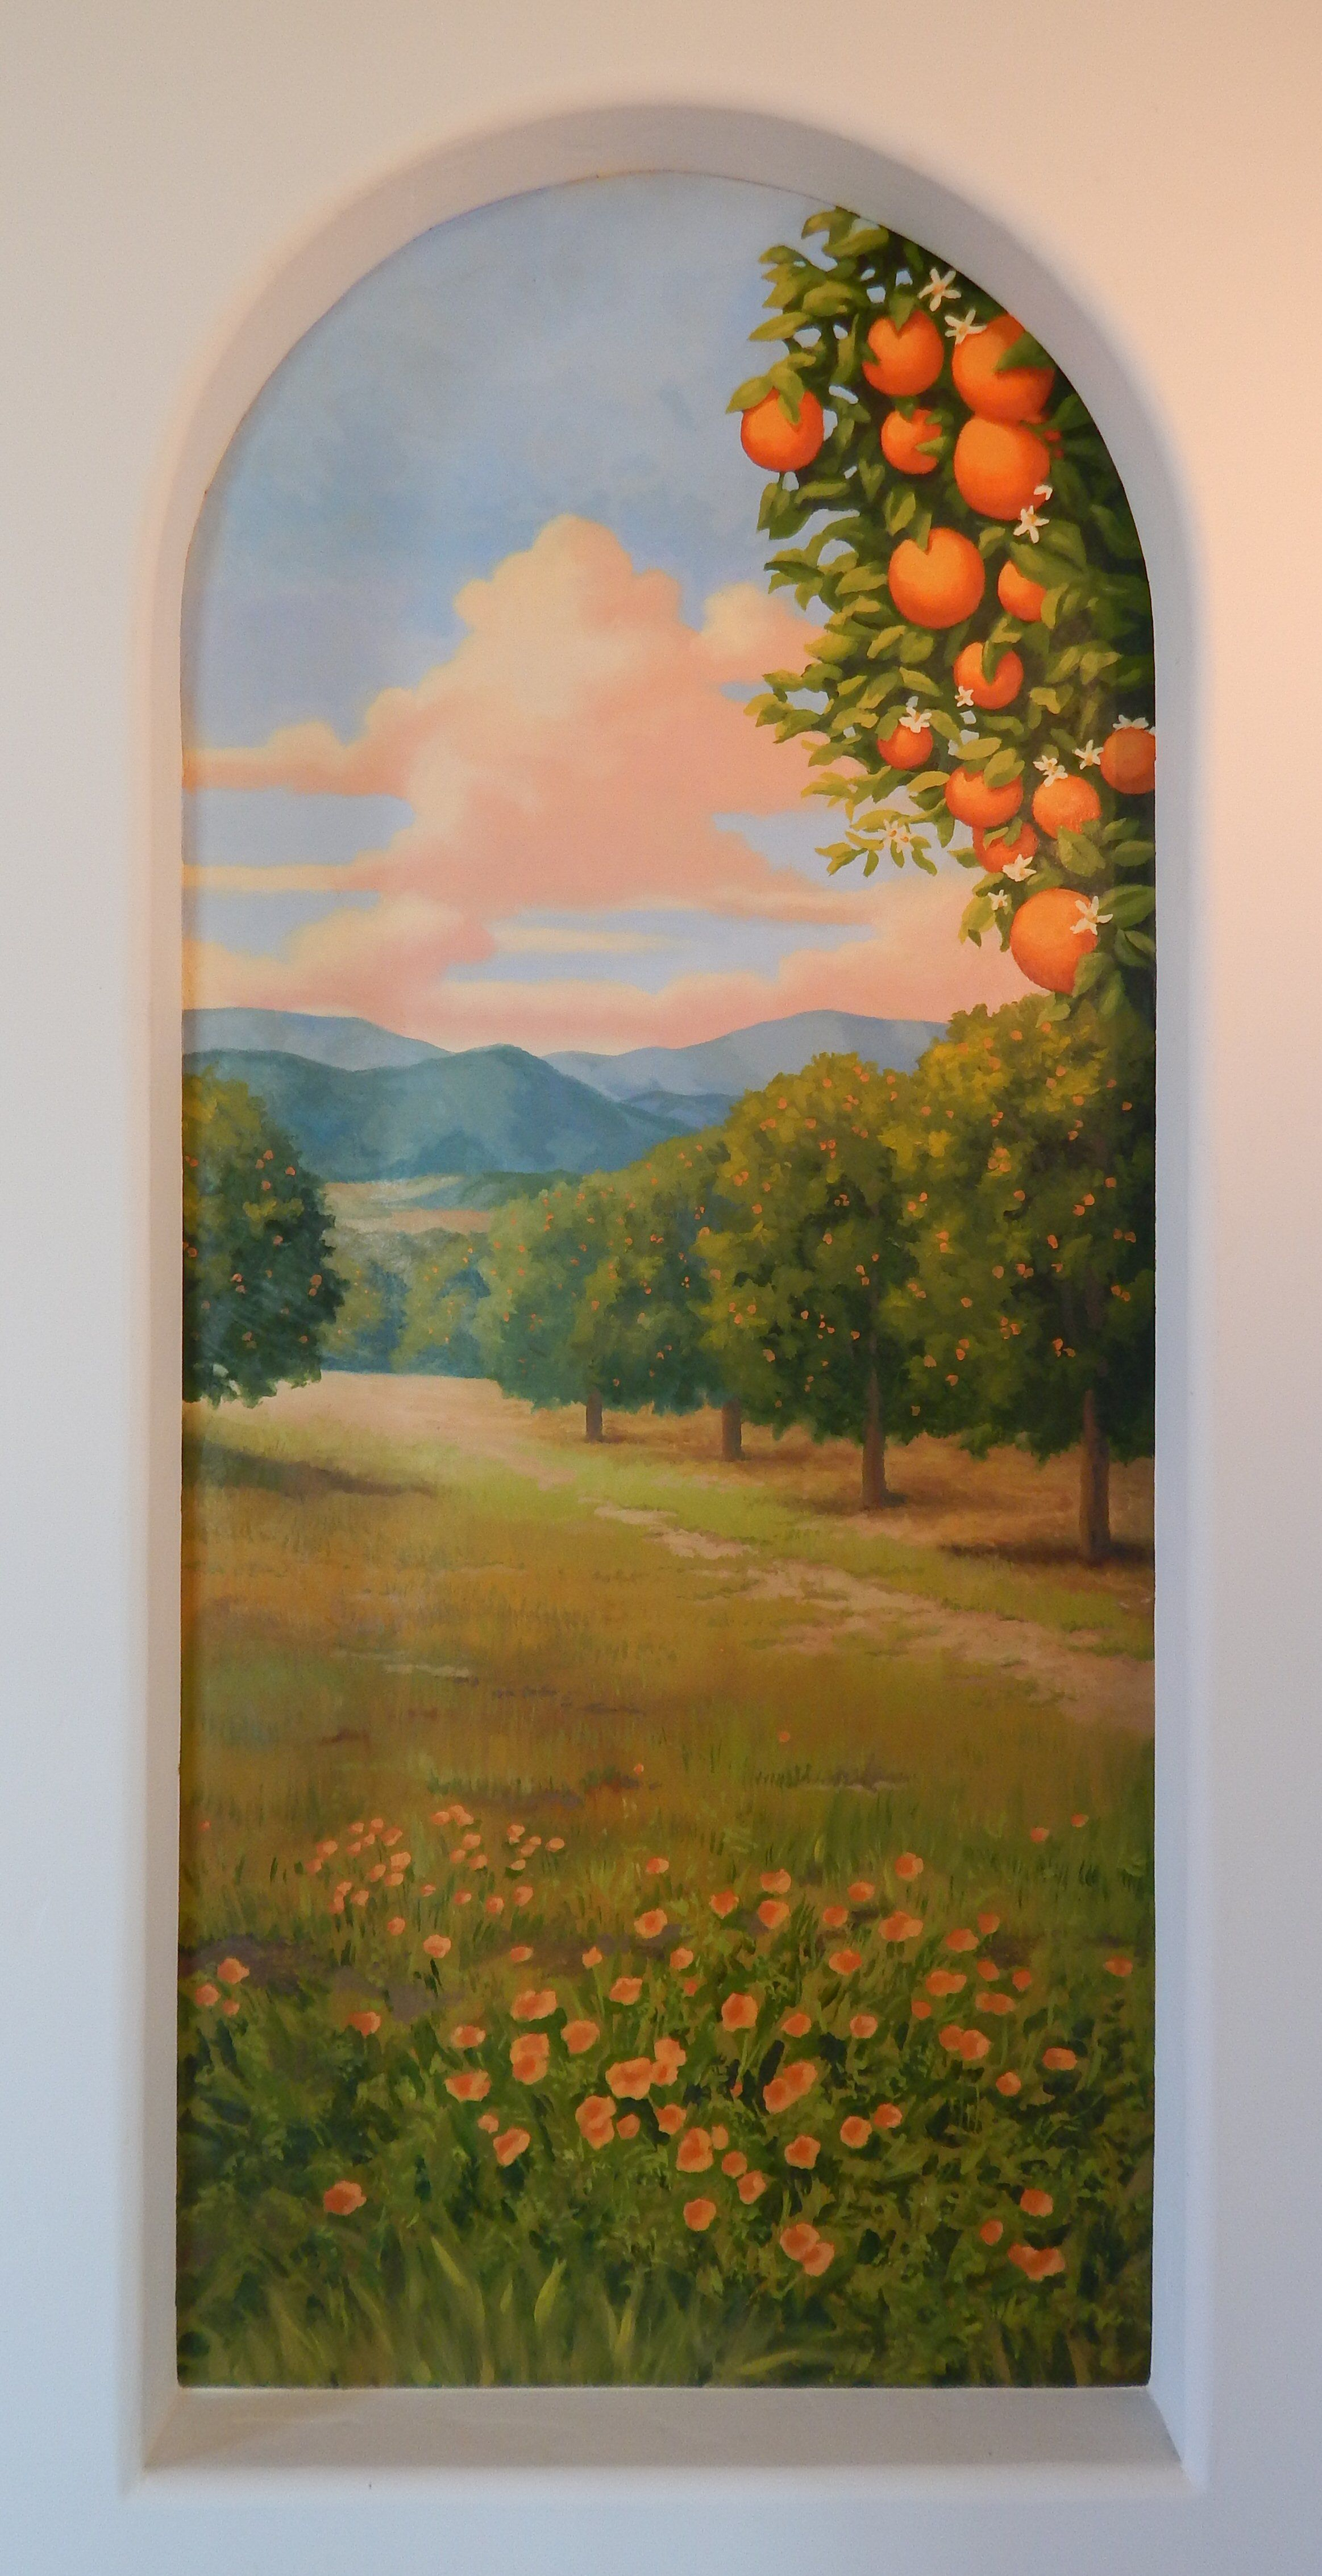 Robert Niche Painting : robert, niche, painting, Niche, Ideas, Mural,, Trompe, L'oeil,, Mural, Painting